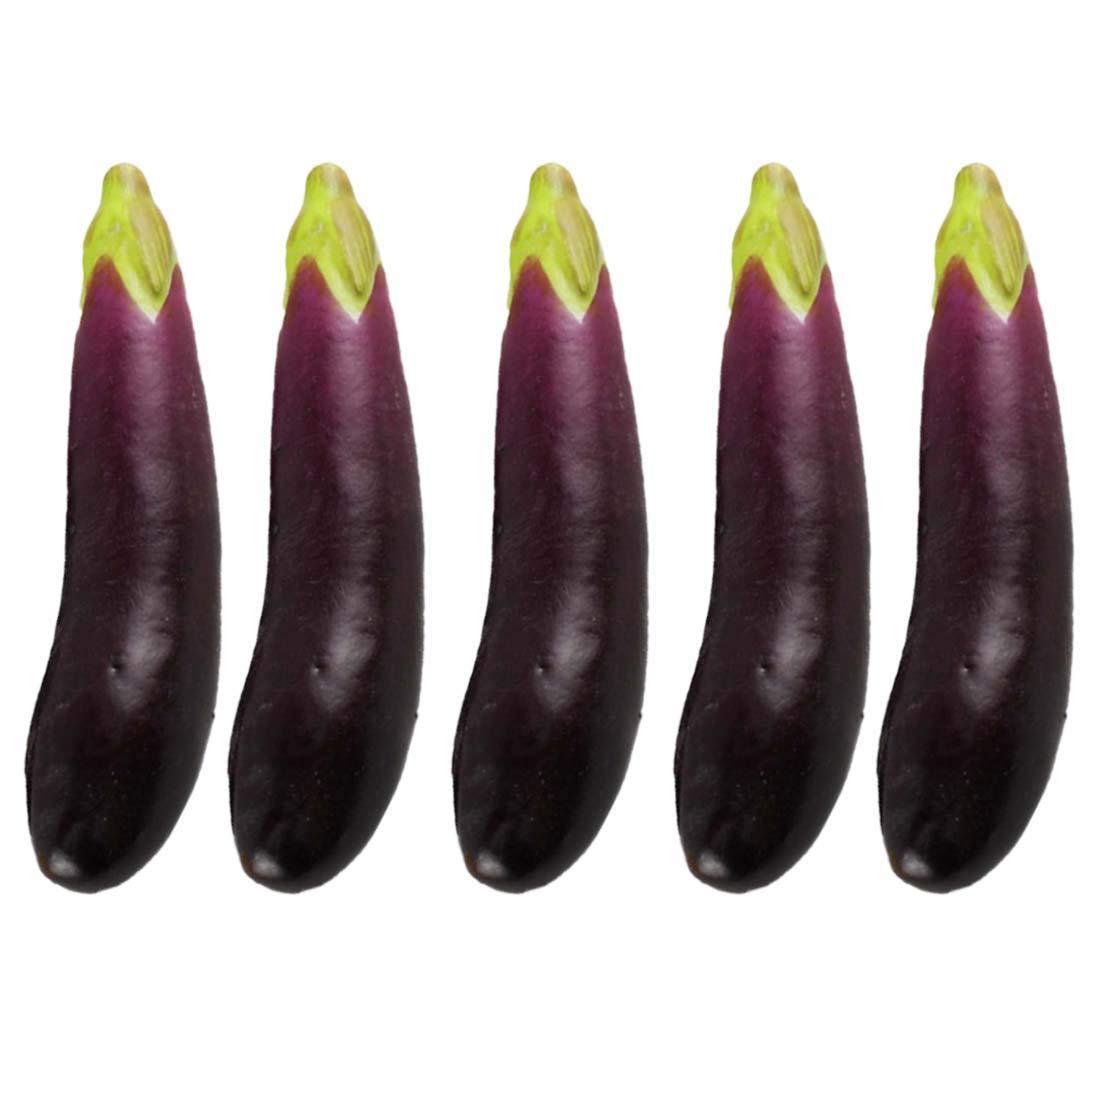 5Pcs Artificial Eggplants Simulation Fake Vegetable Photo Props Home Decoration Lorigun